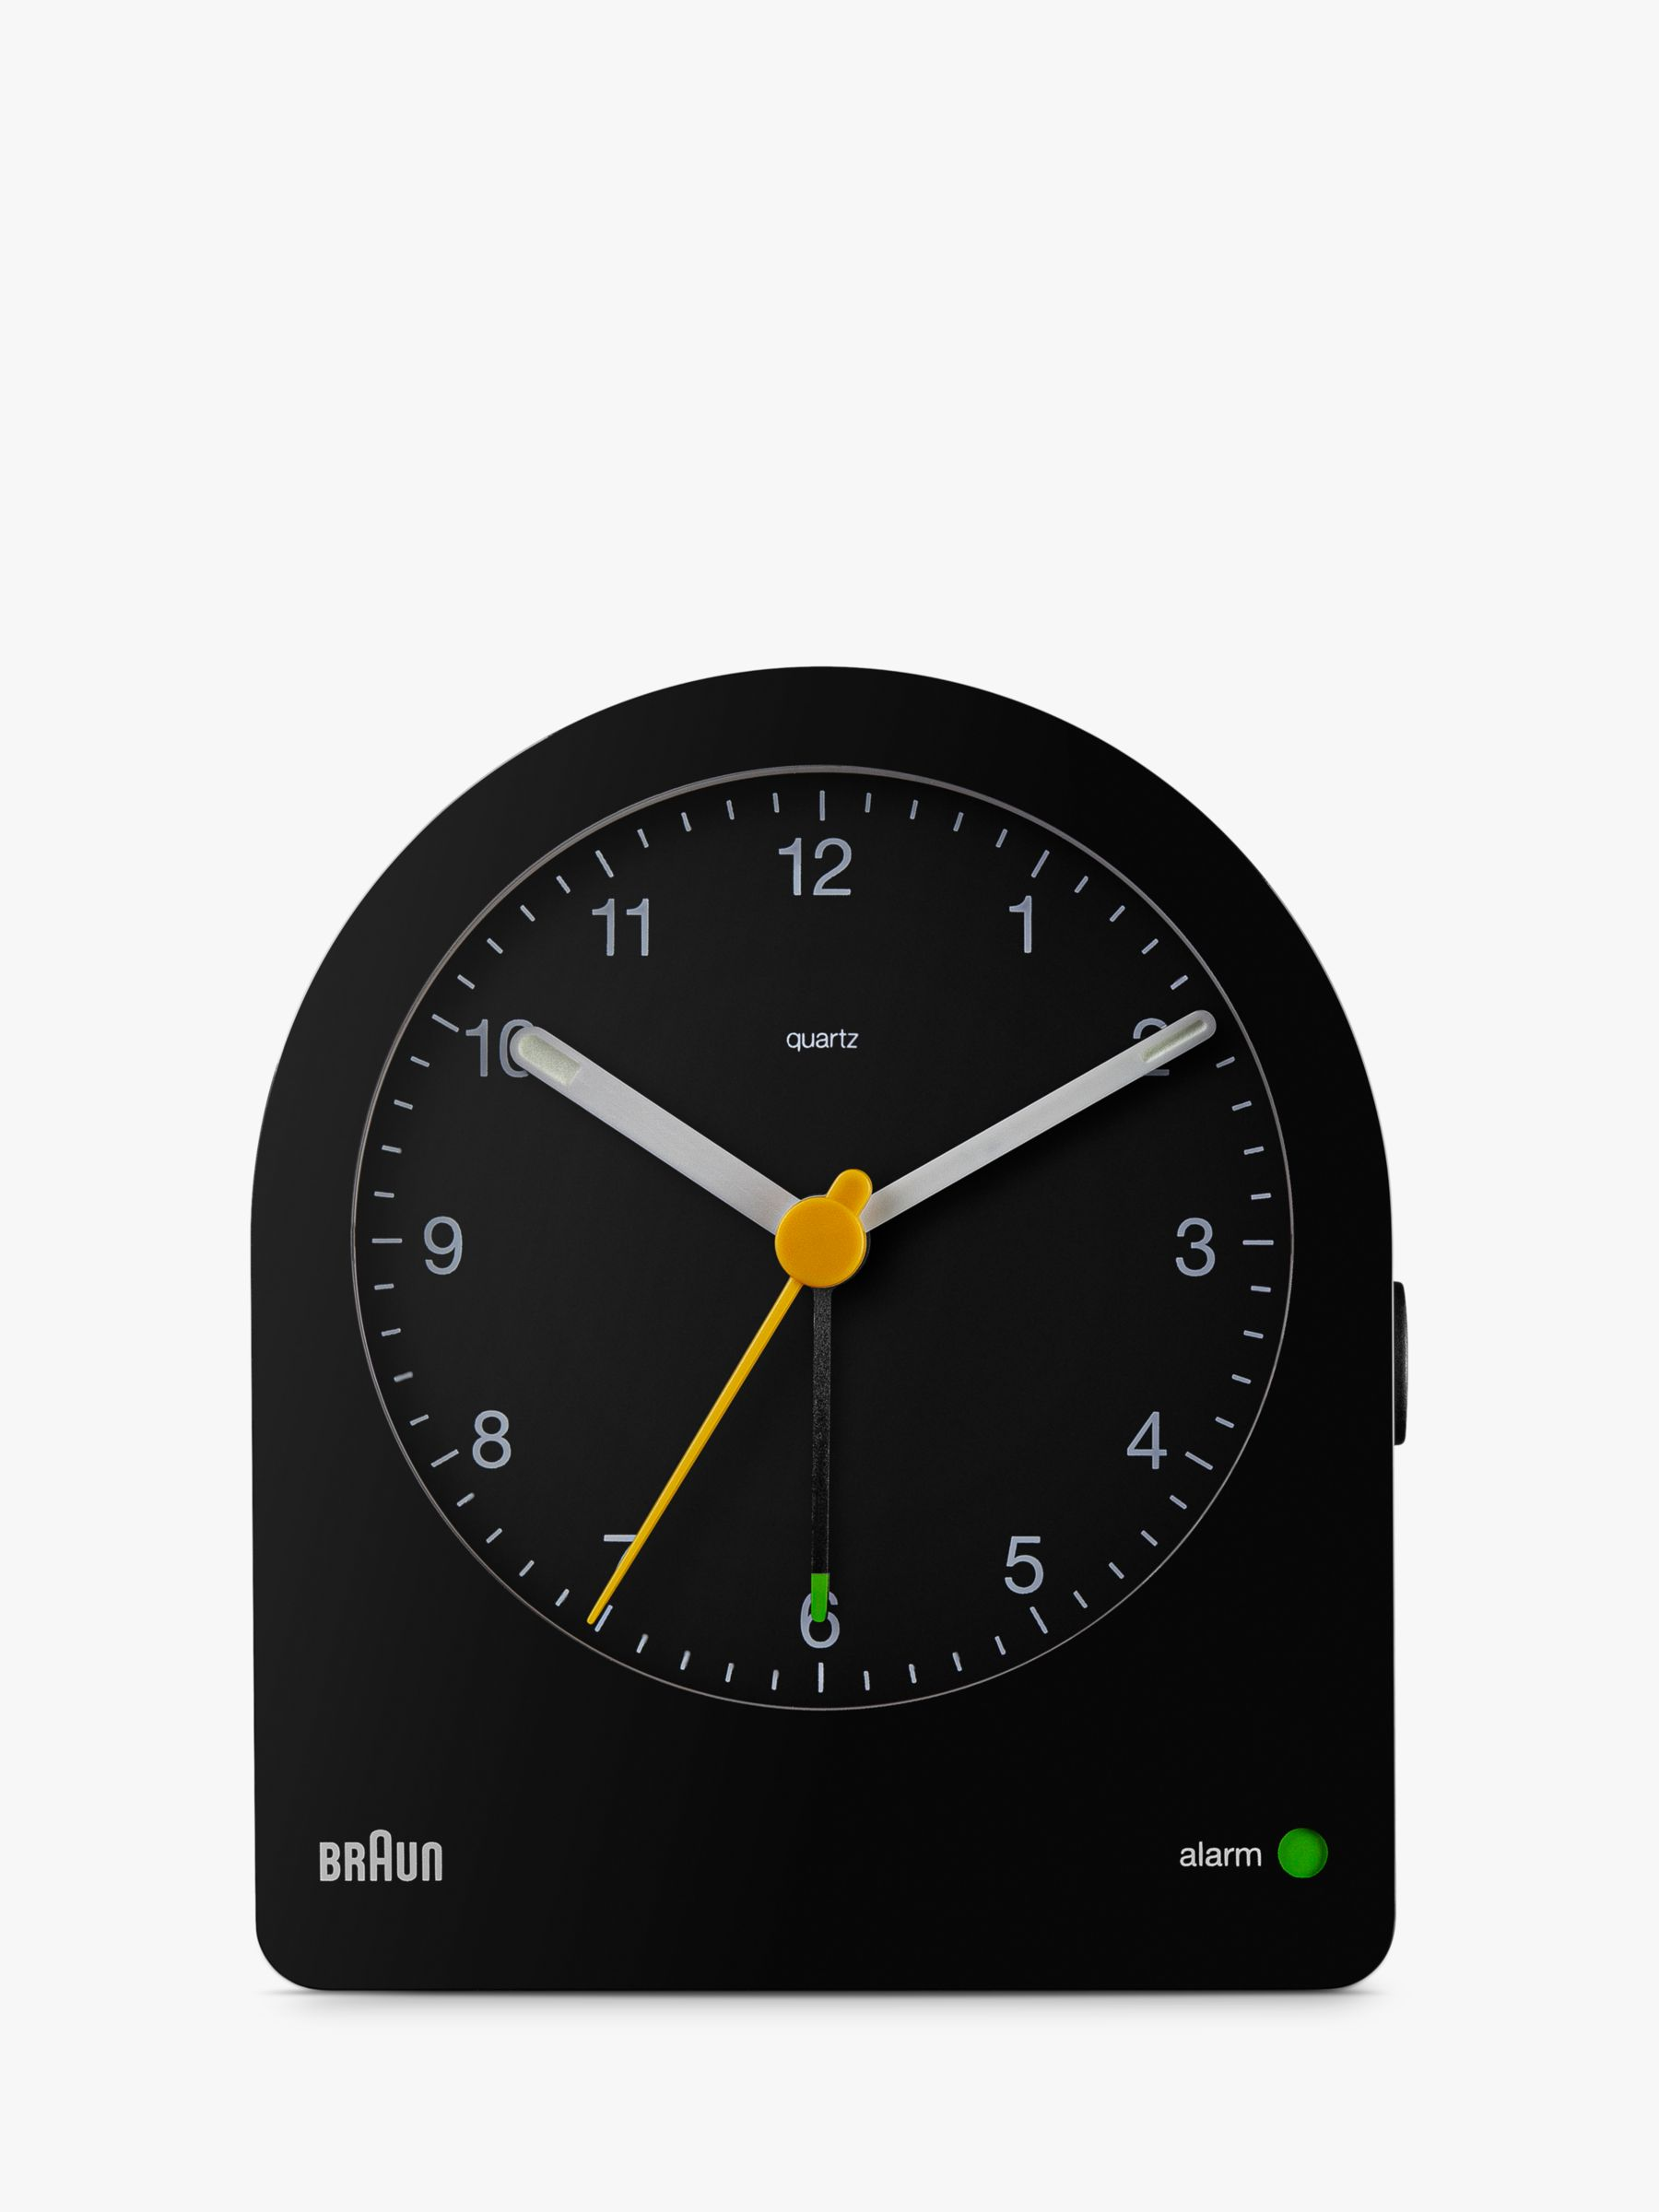 Braun Analogue Alarm Clock, Black